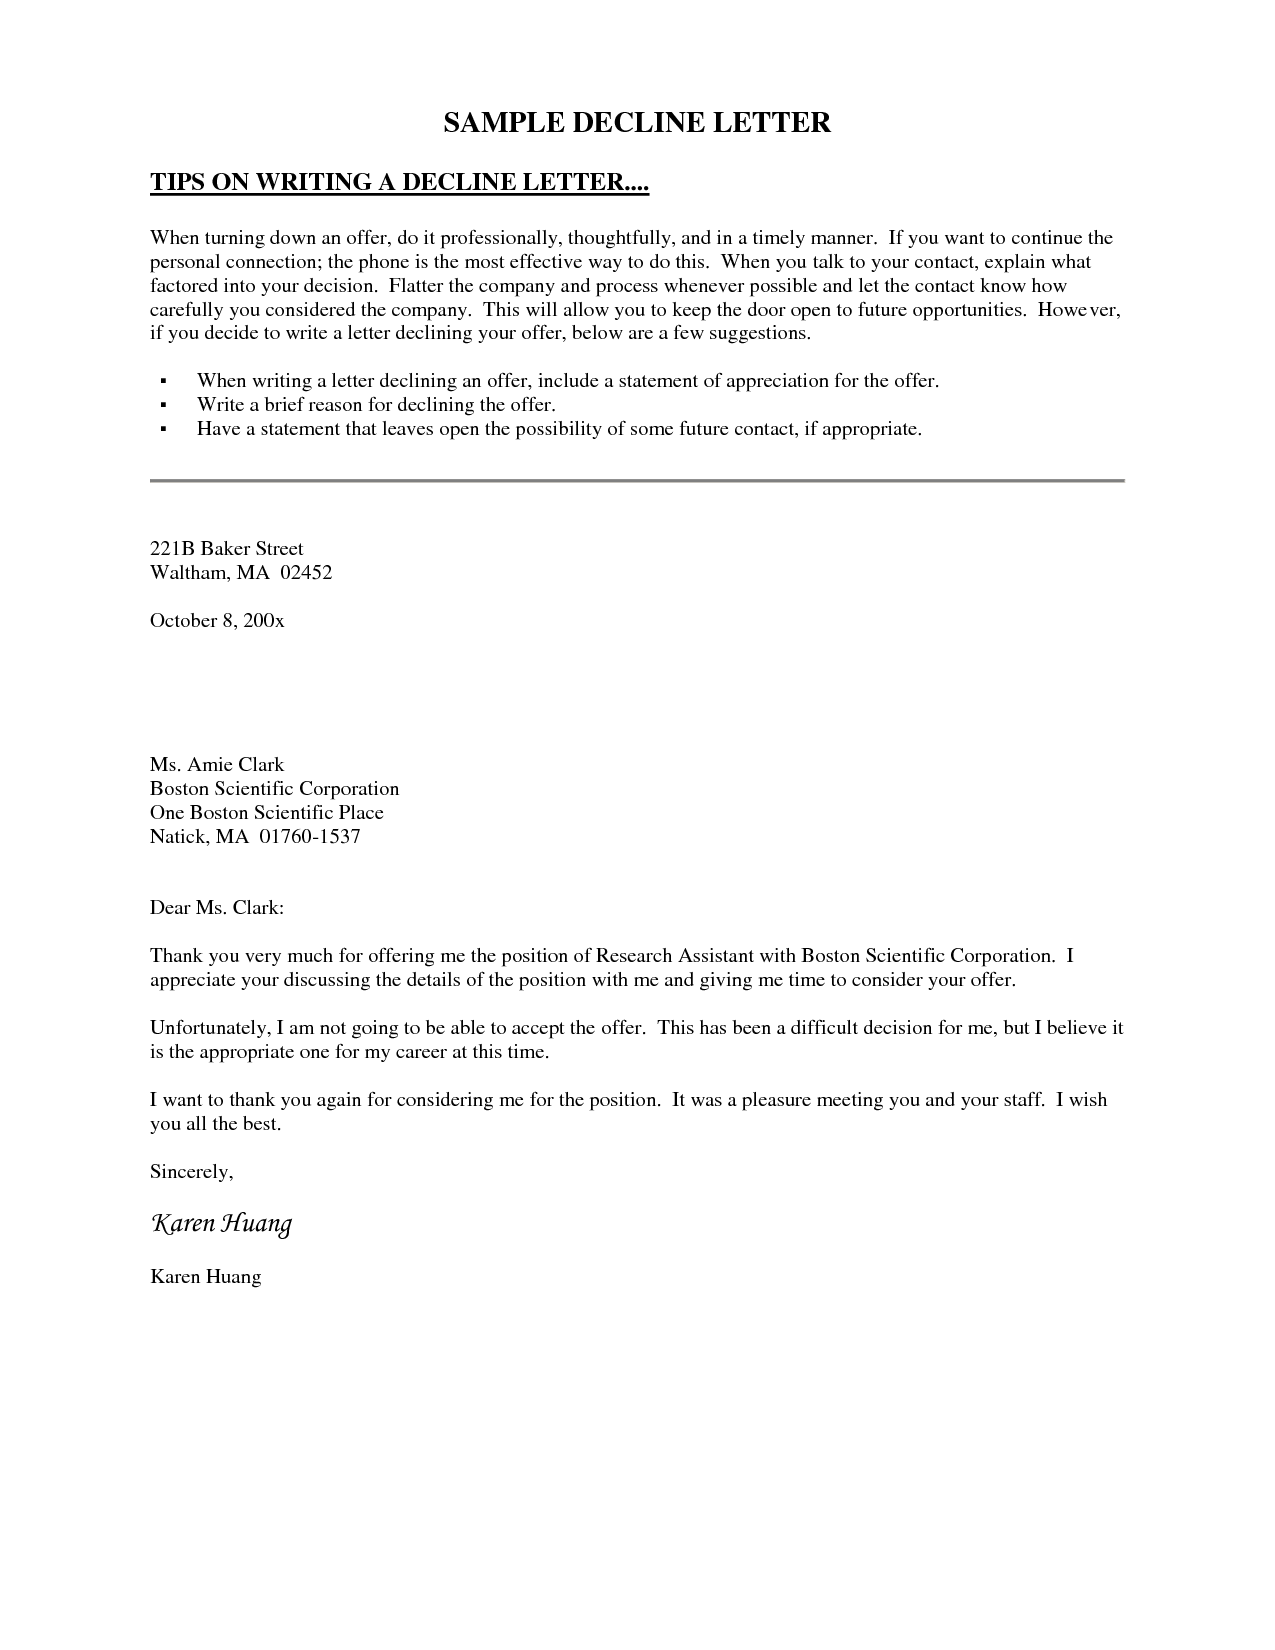 21 Decline Letters ideas  business letter, lettering, letter sample